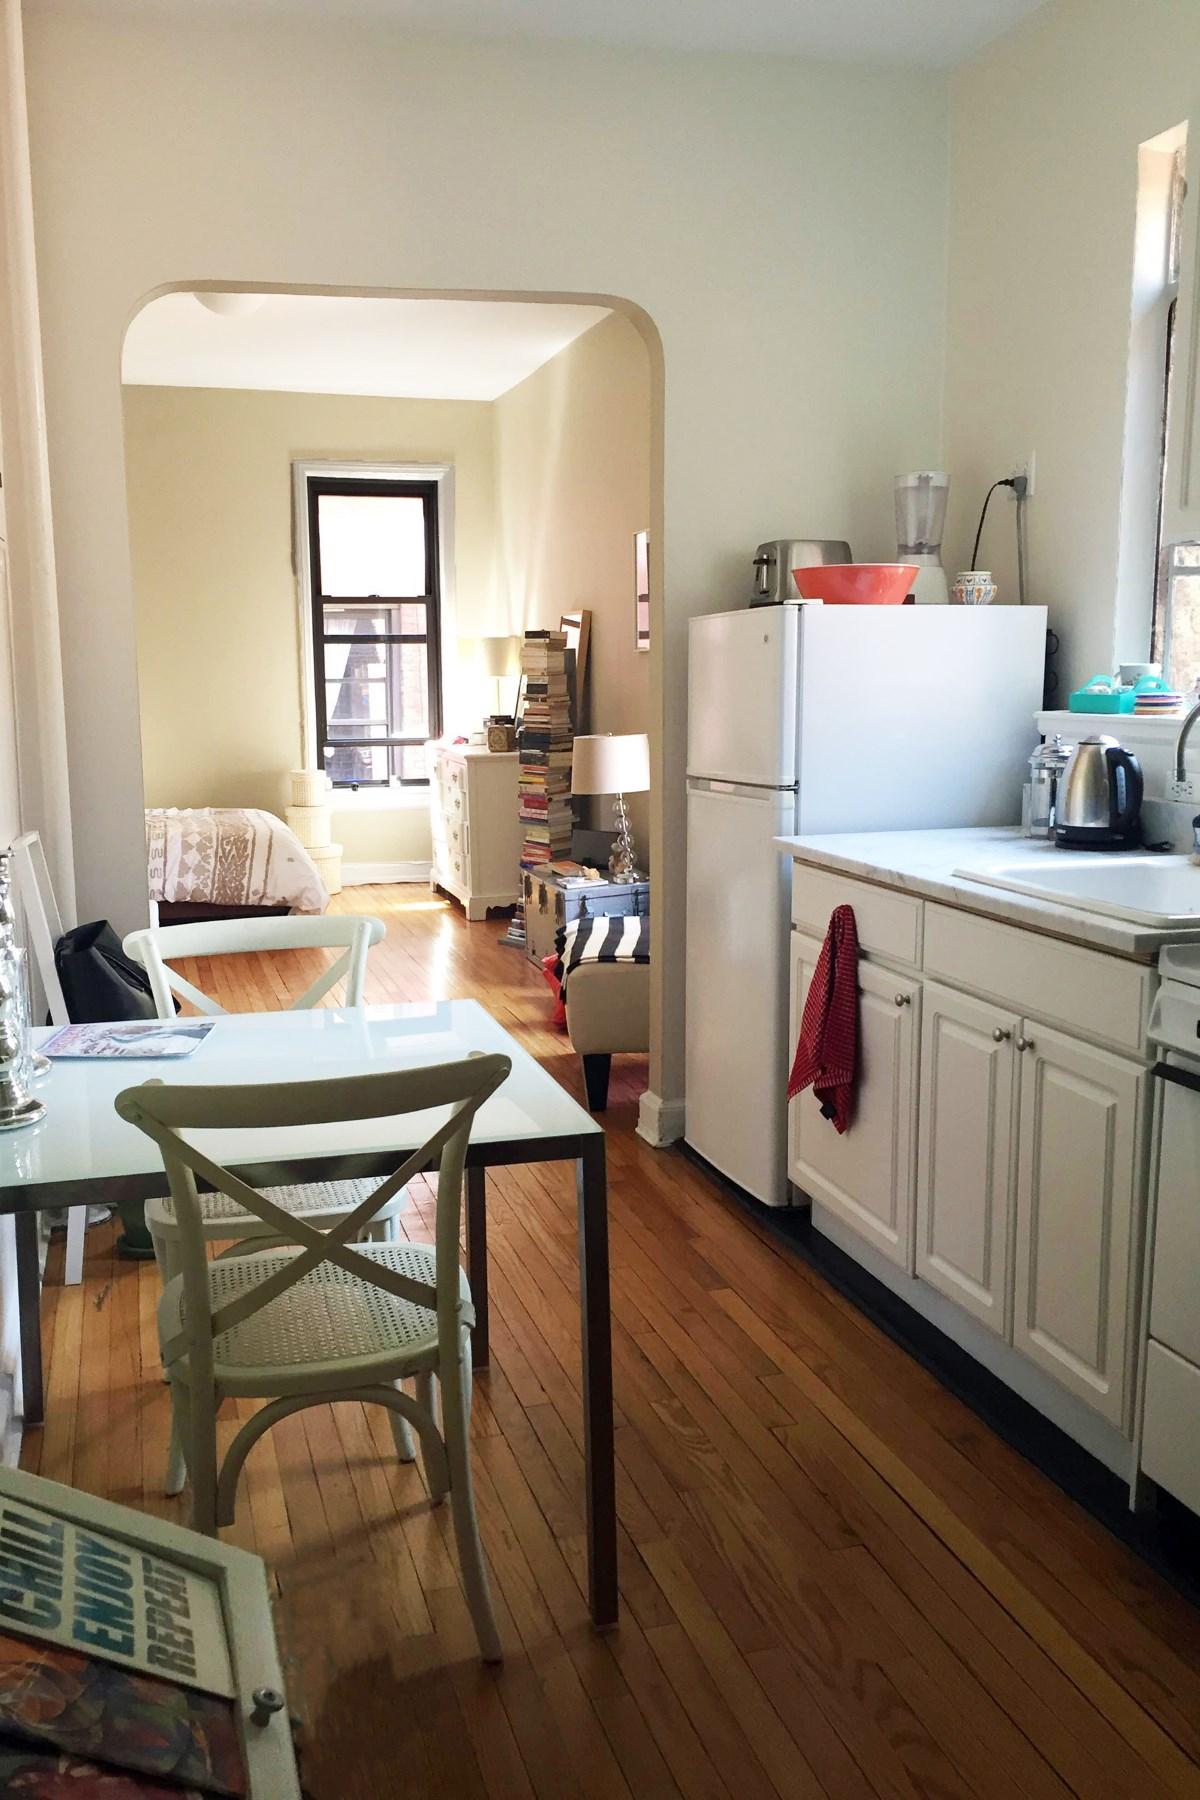 Property Of 100 West 73rd Street, Apt. 3D